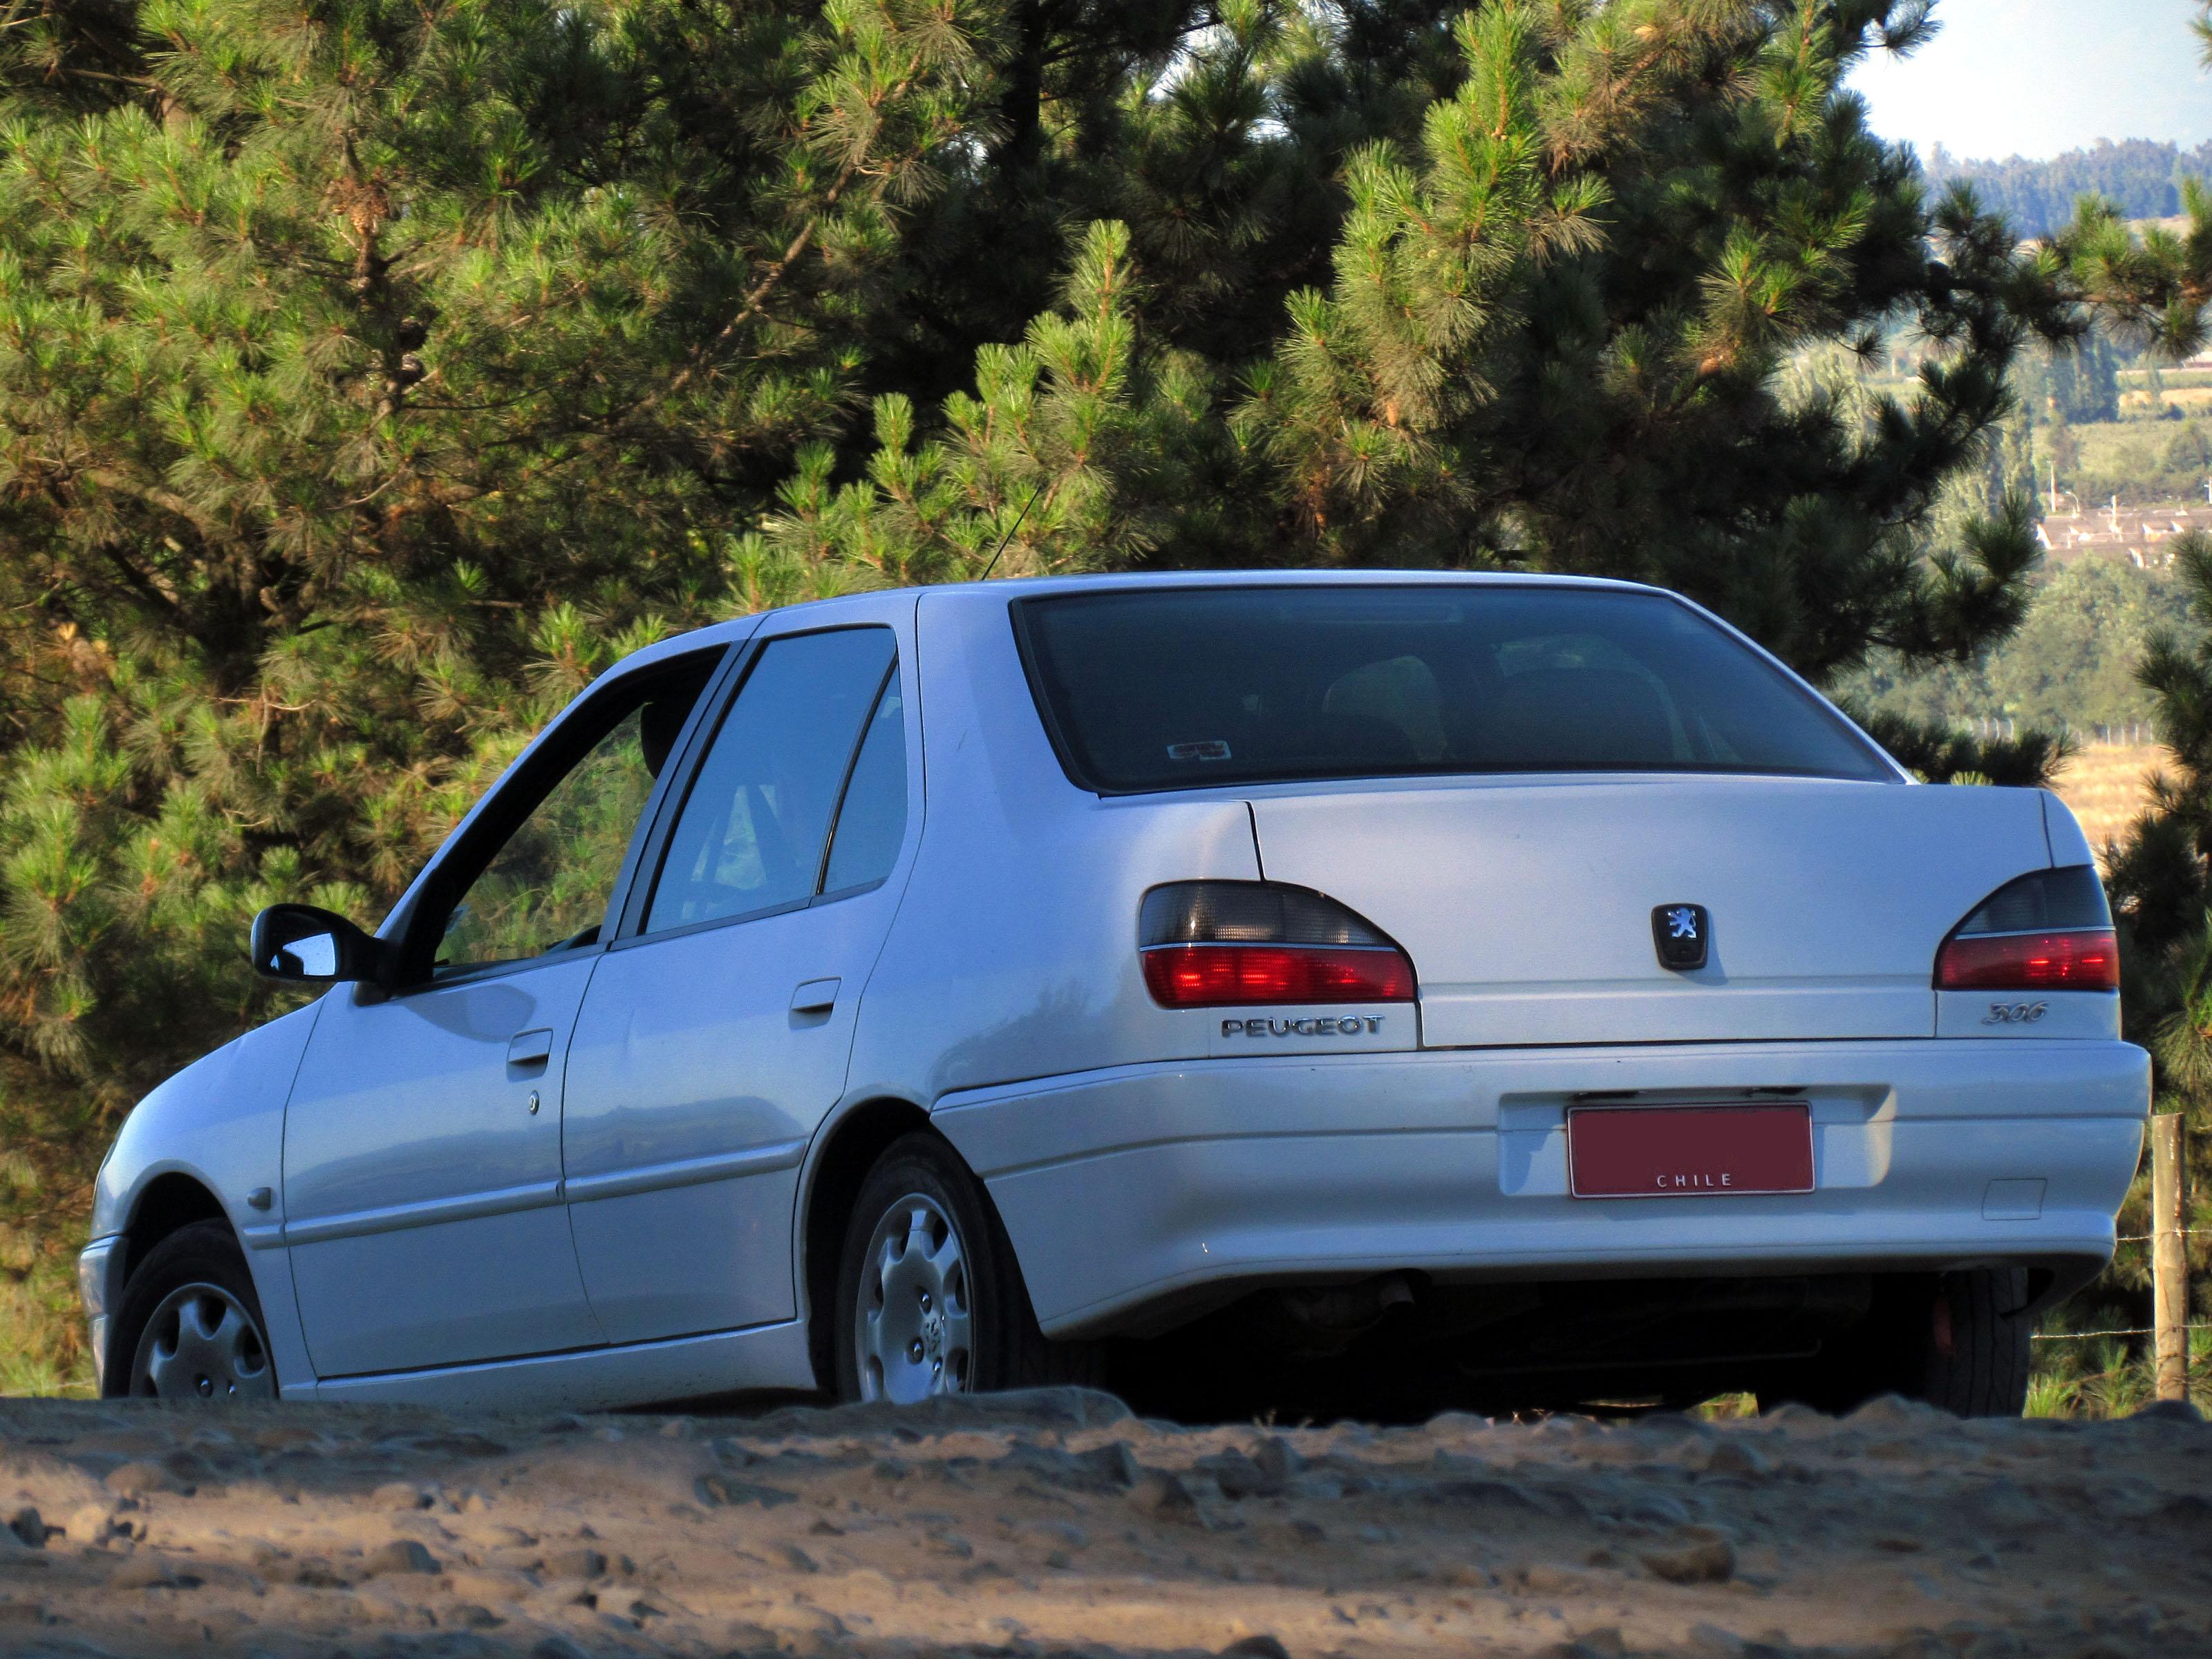 File Peugeot 306 Xr Sedan 2001 12059834655 Jpg Wikimedia Commons